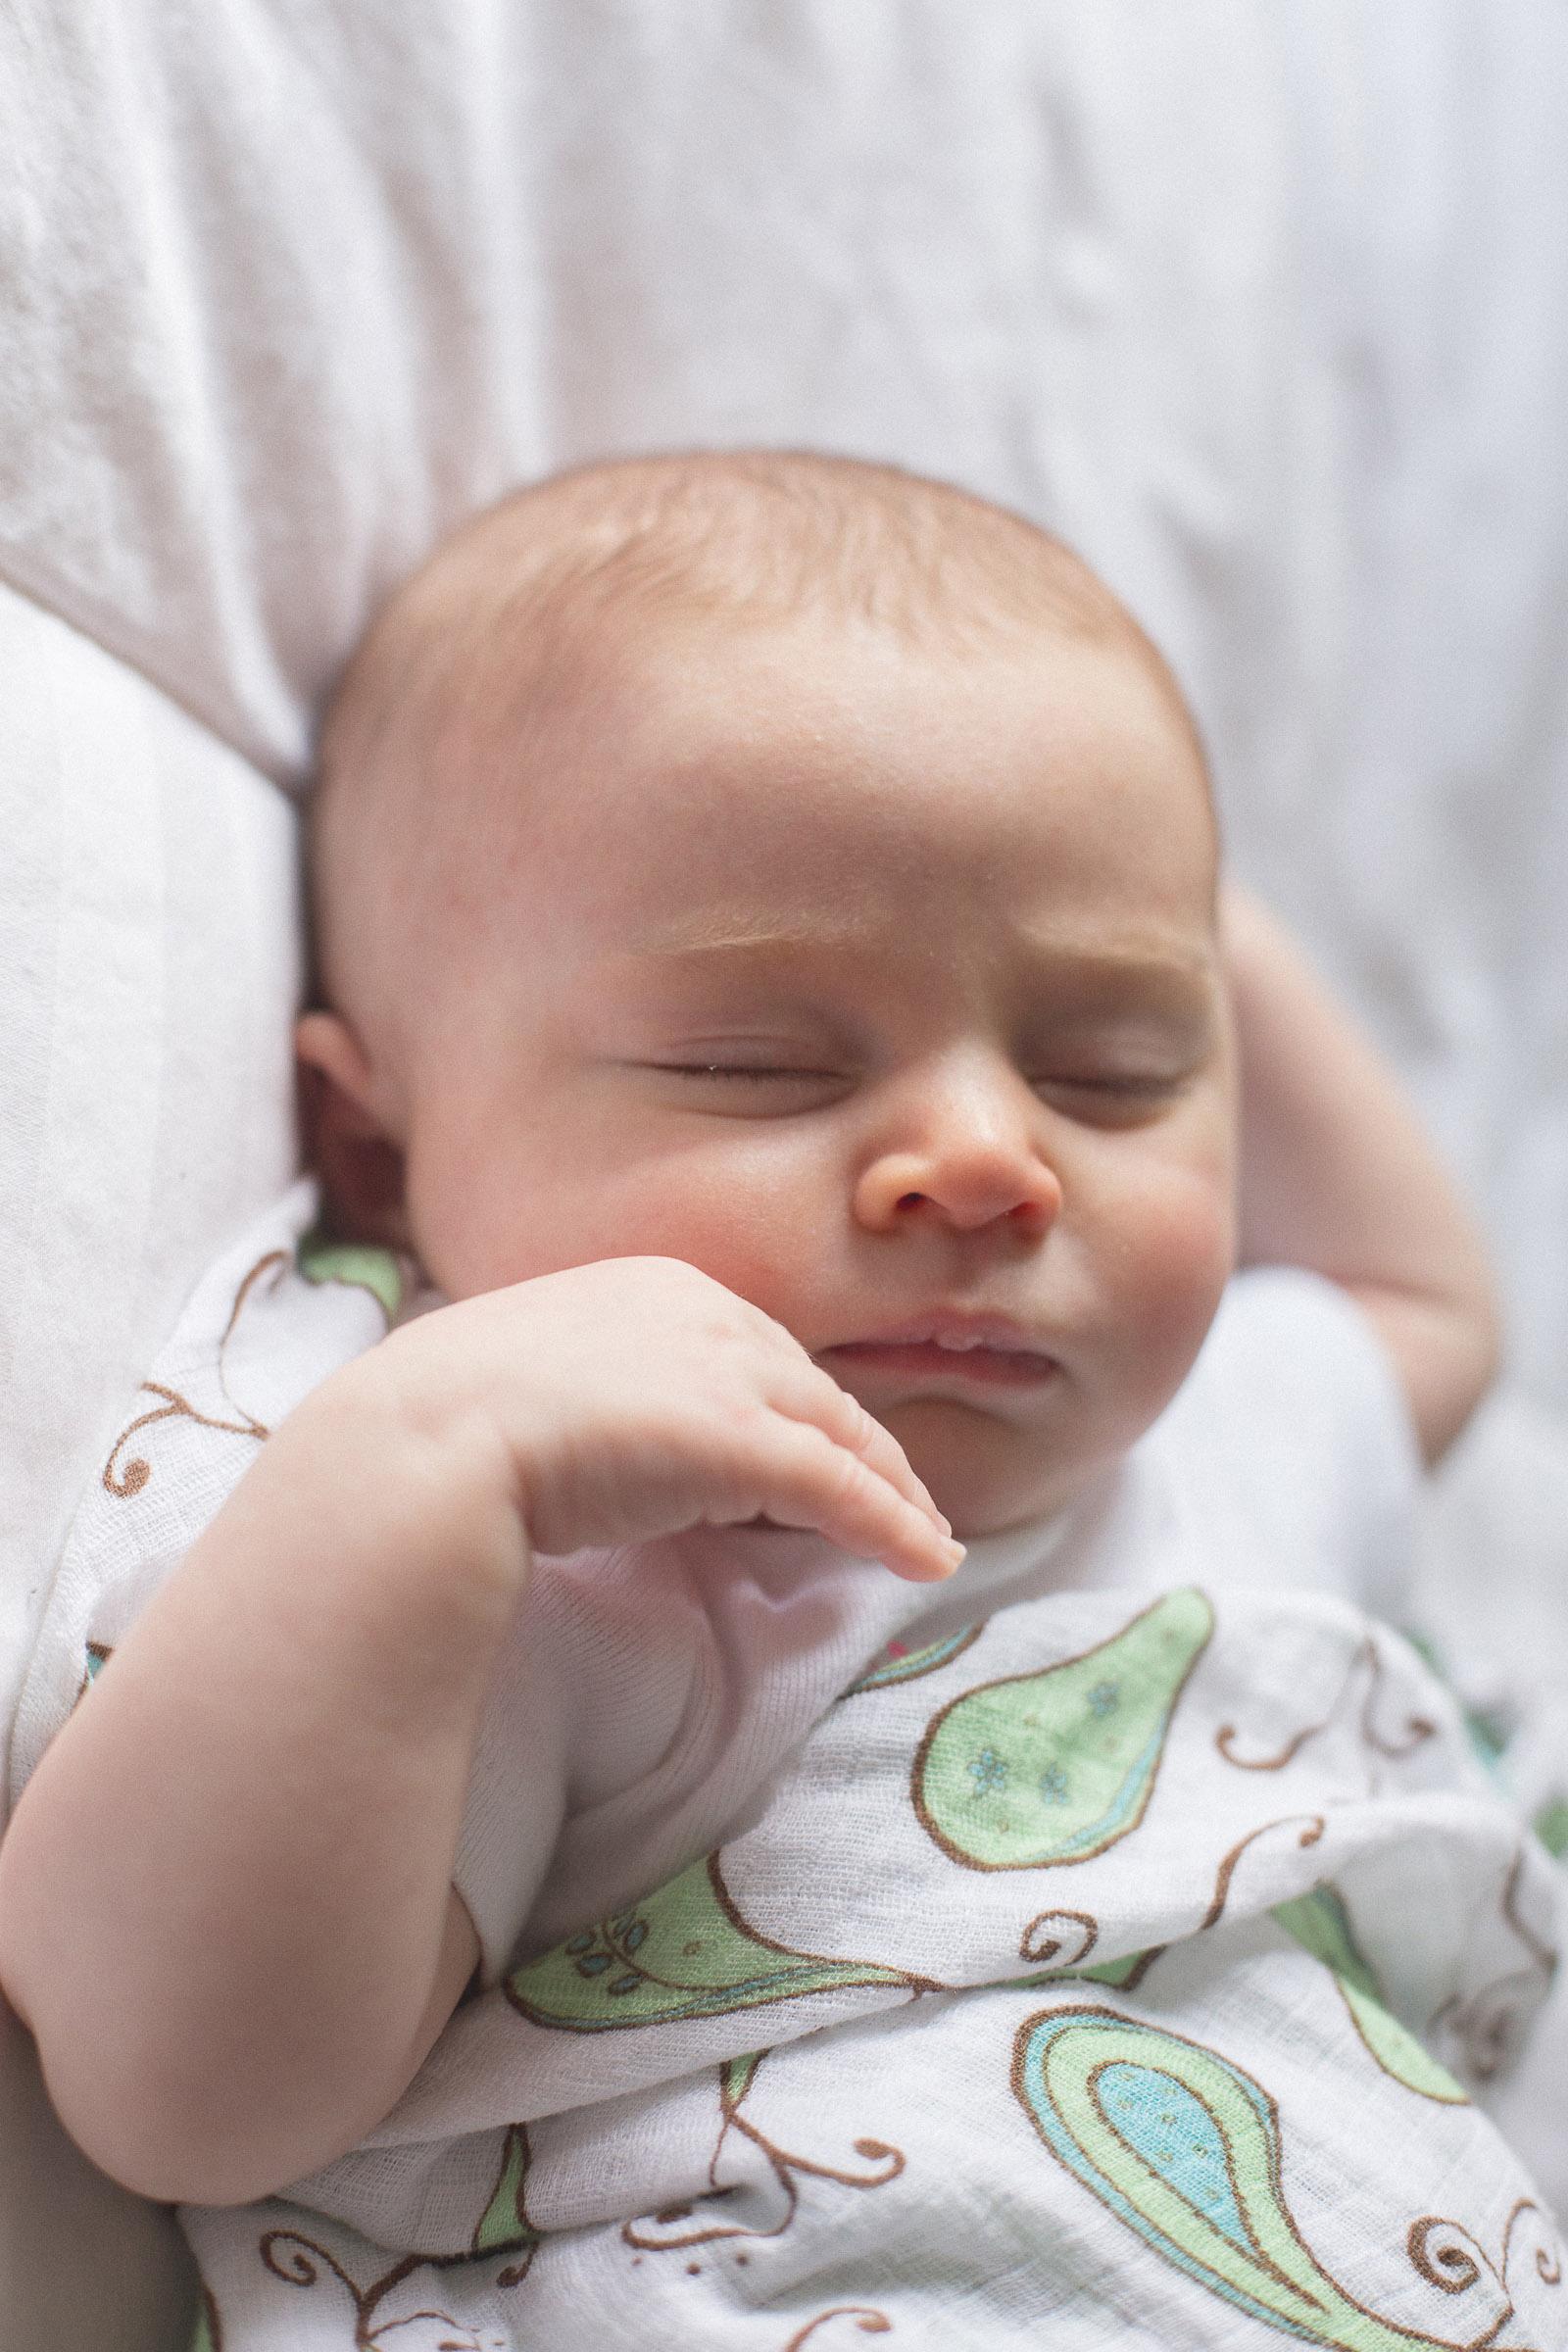 028-nursery-baby-family-birds-sleeping-woodland-new-mexico-farmington